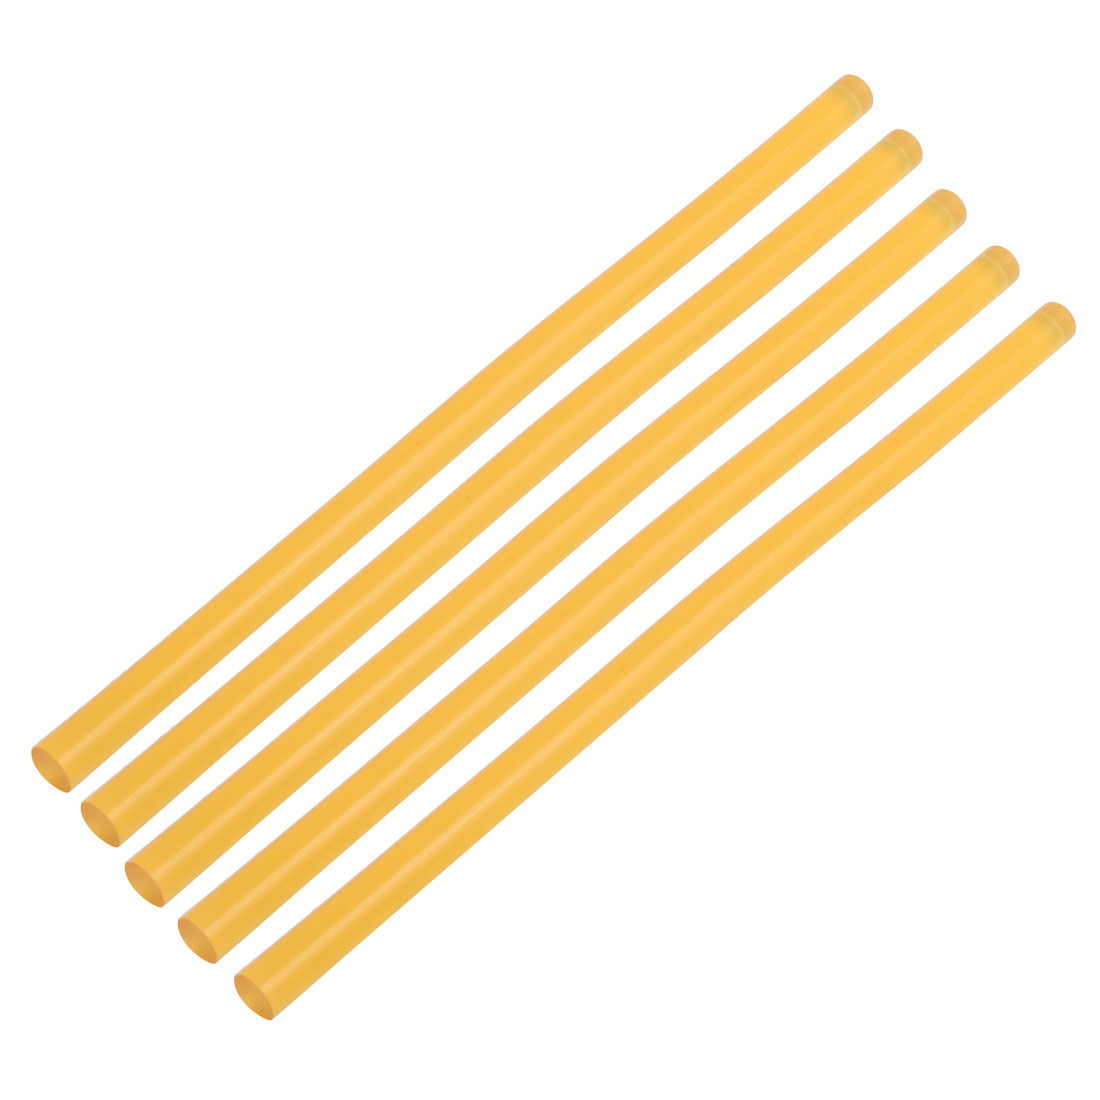 11mmx270mm Heating  Hot Melt Glue Adhesive Stick Yellow 5pcs